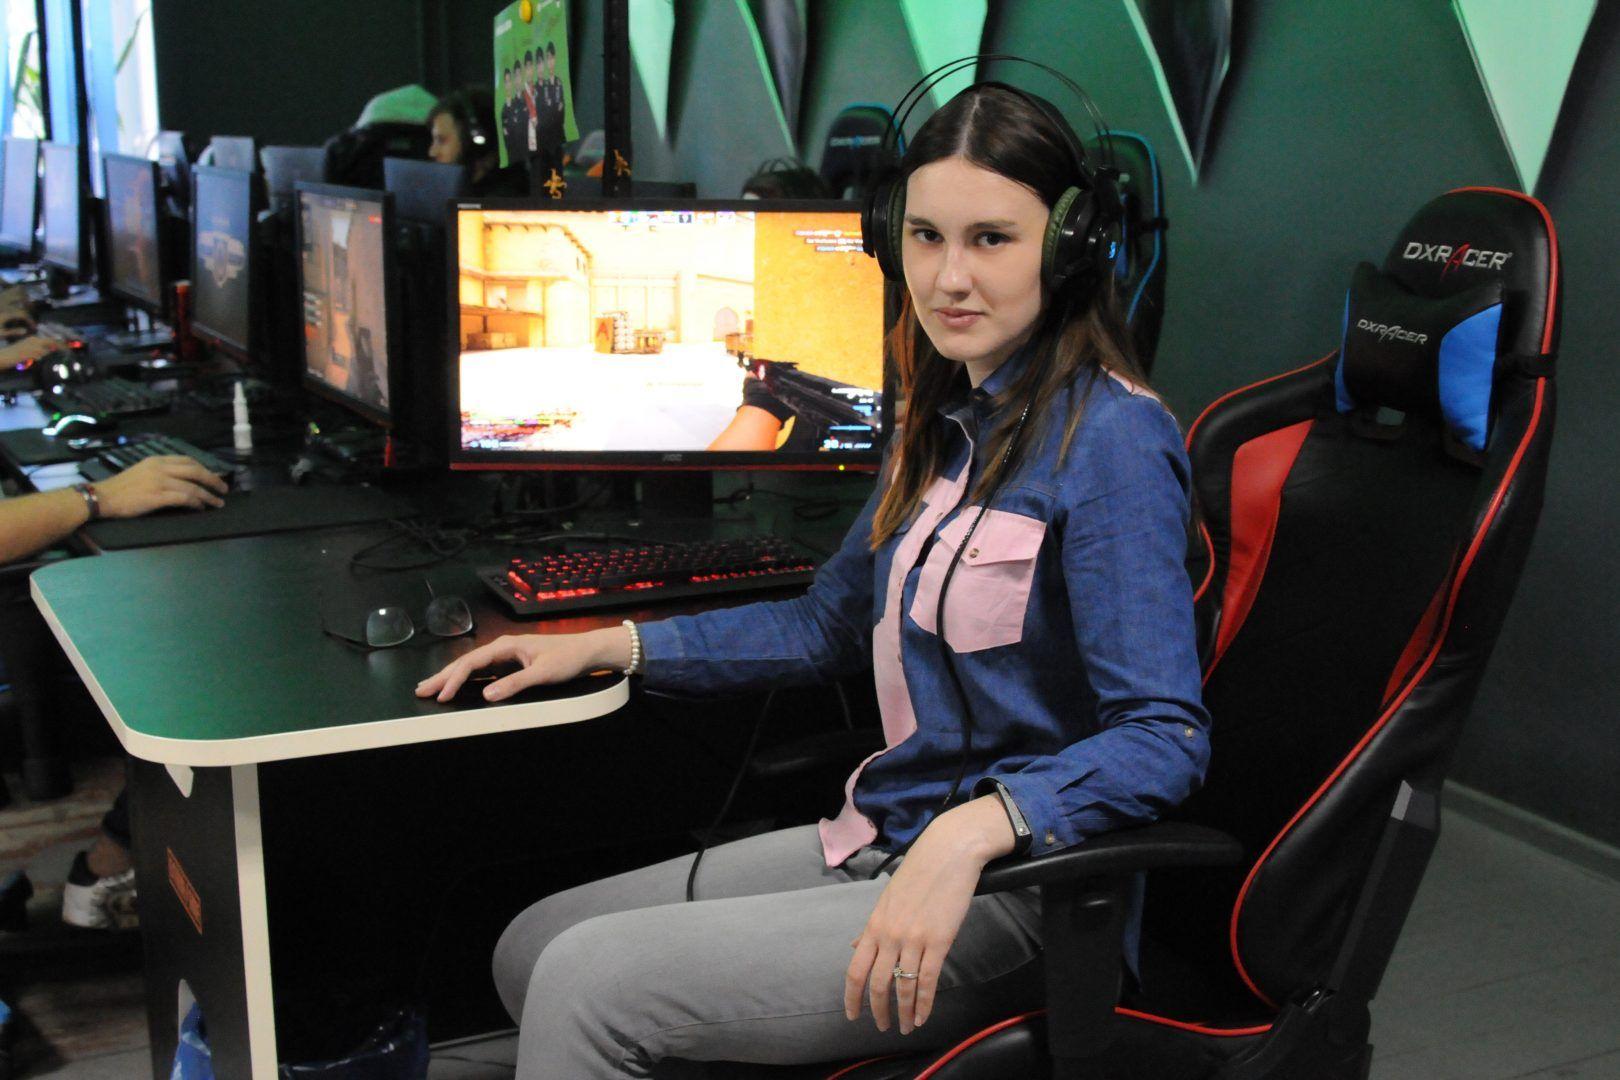 Центр киберспорта планируют возвести в Новой Москве. Фото: Светлана Колоскова, «Вечерняя Москва»